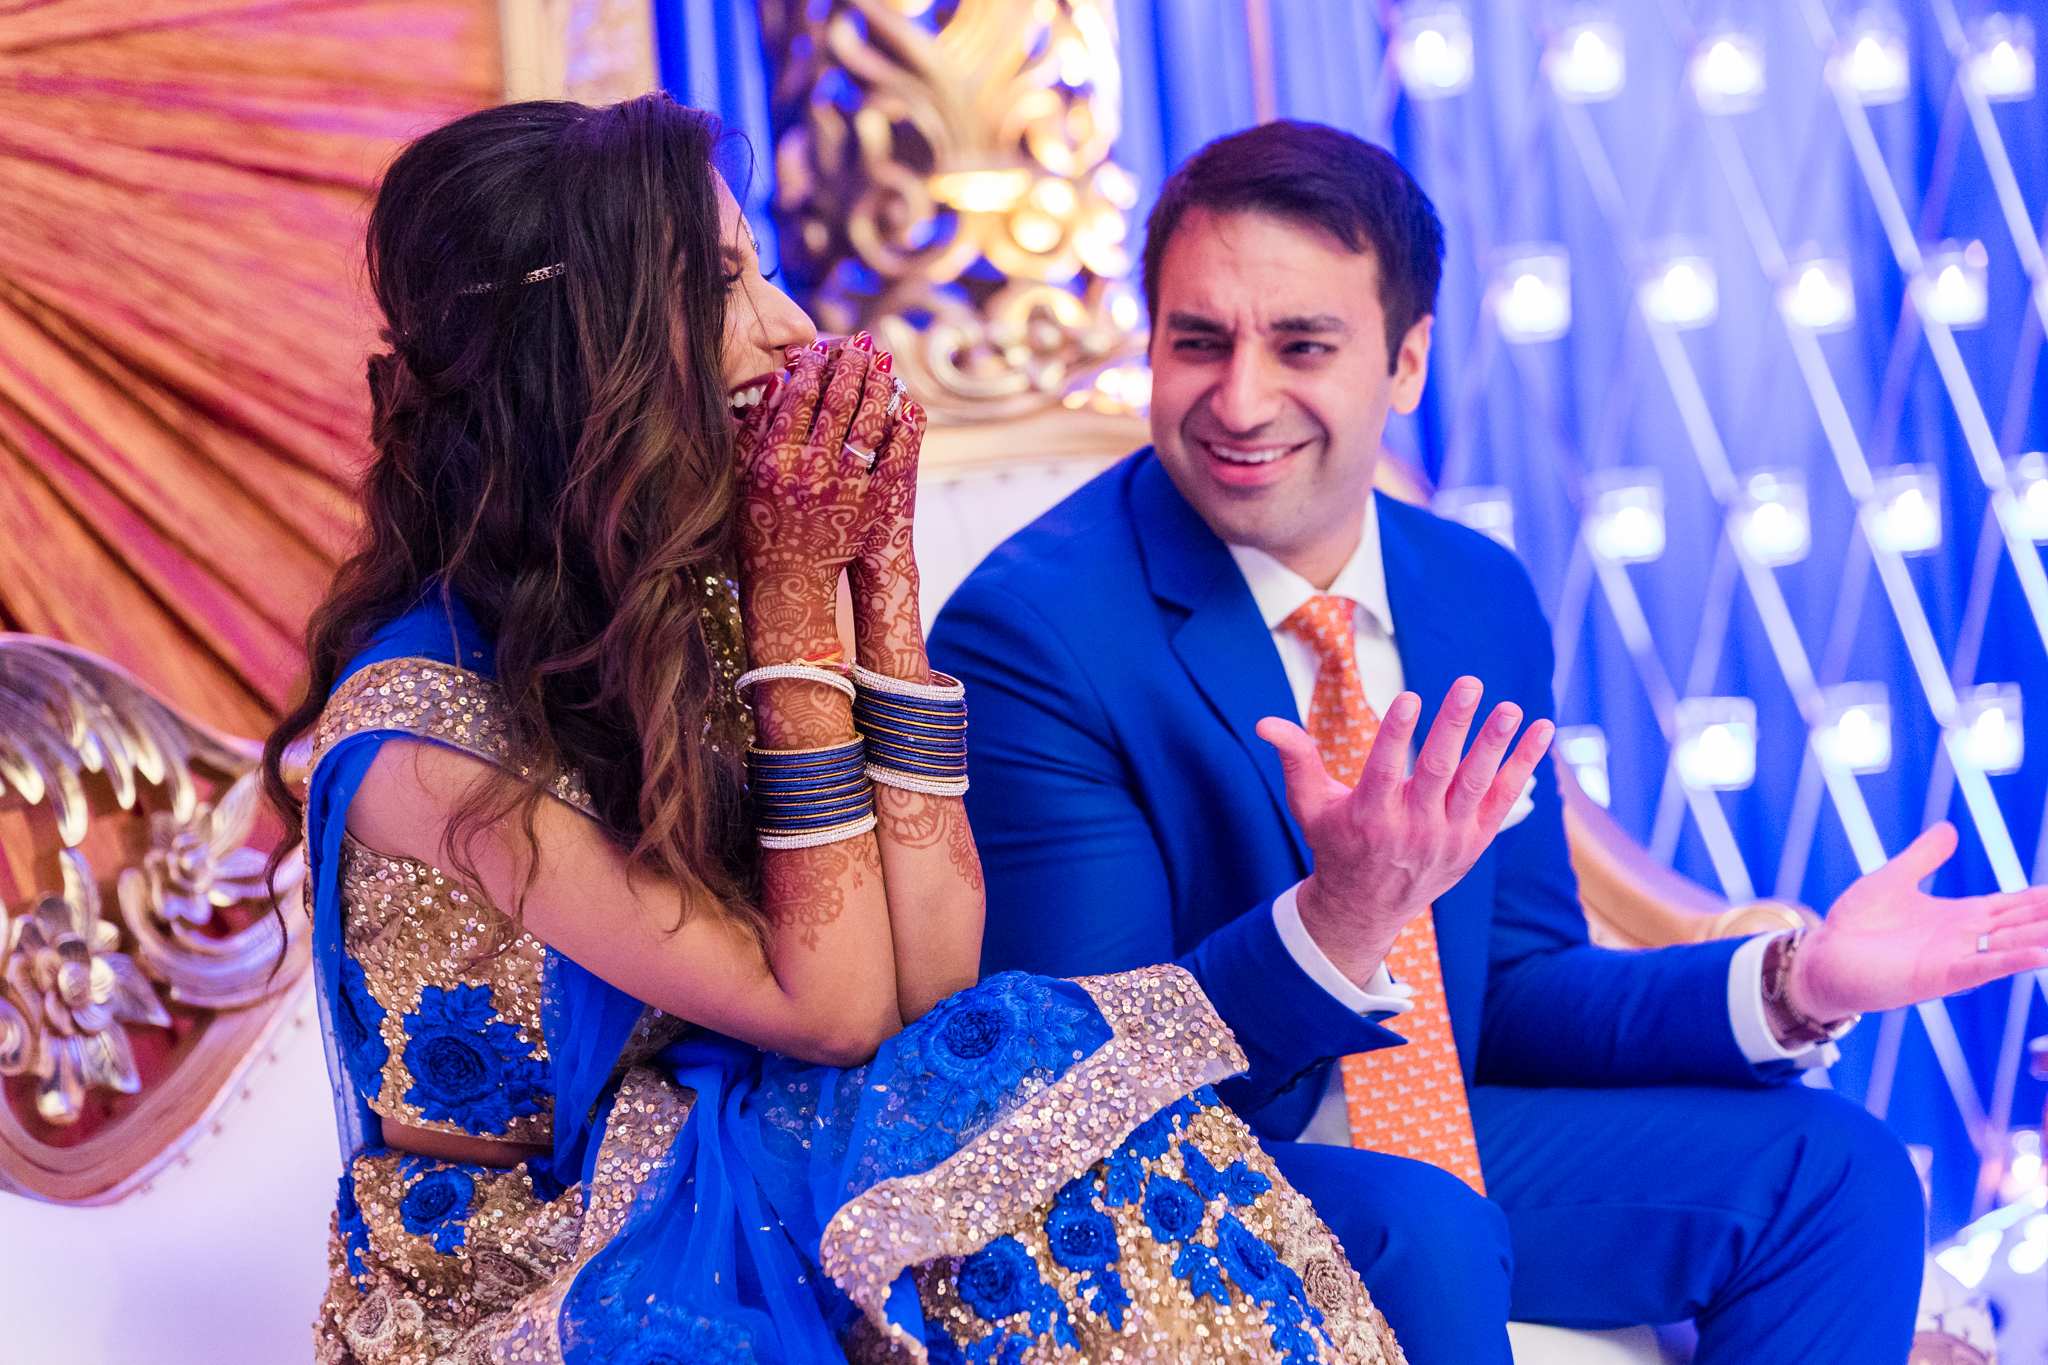 ReeyaAman-Wedding-Photography-www.MnMfoto.comMnMfoto-Krishna-Sajan-1613.jpg